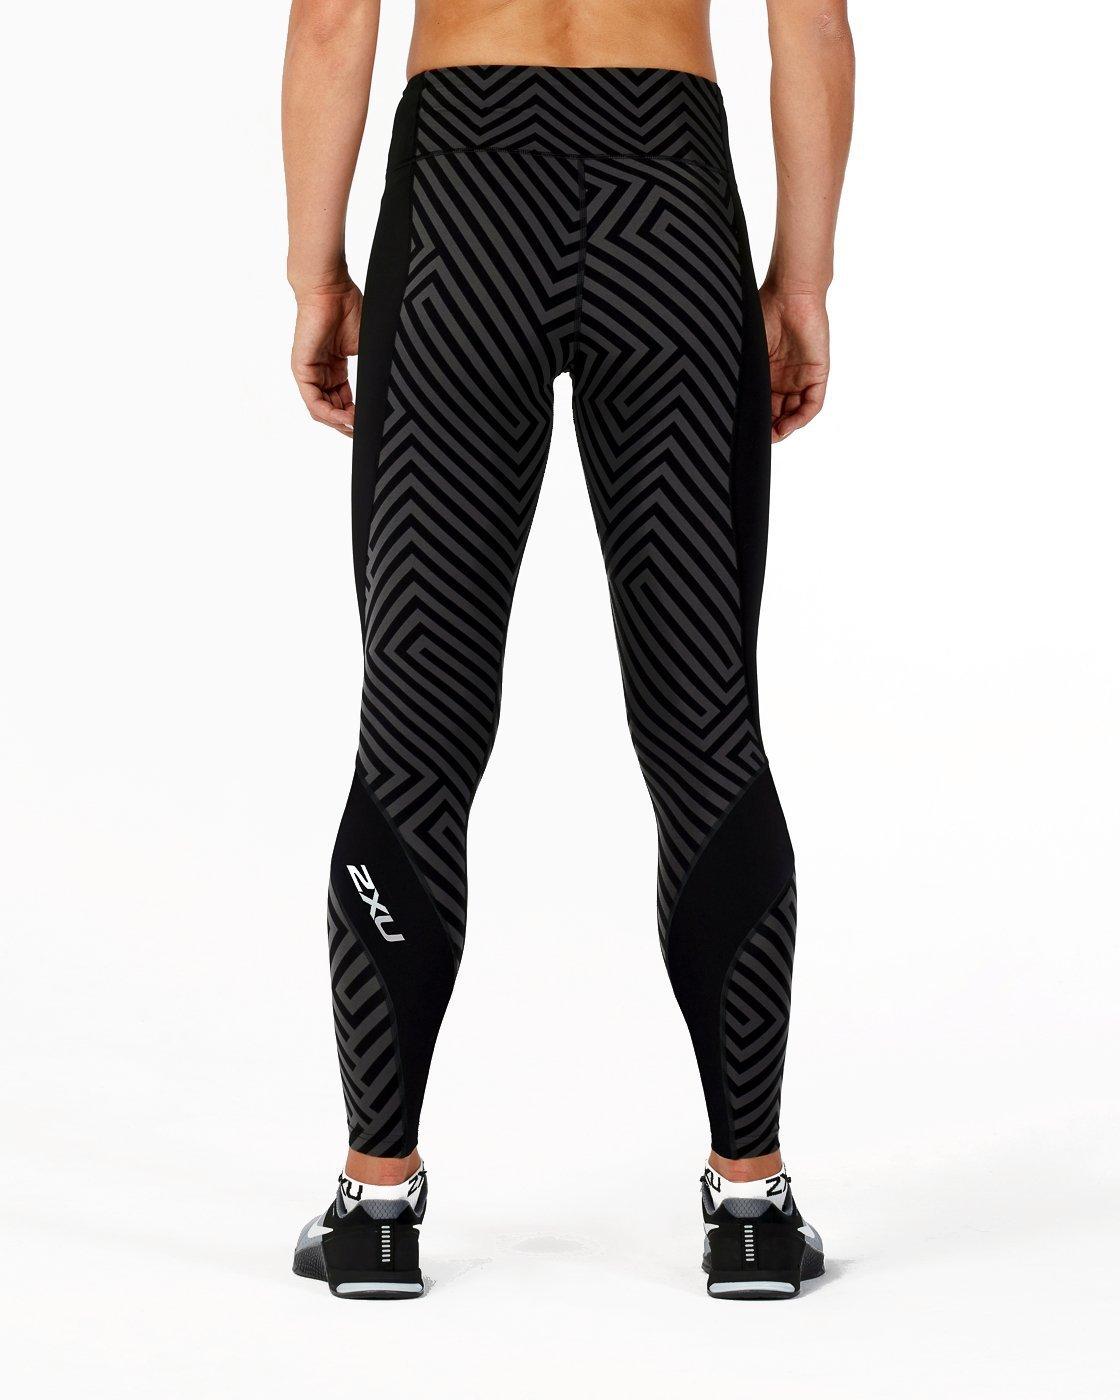 fcb0fcea20 2XU Womens Fitness Compression Tights w/Storage WA4602b-P: Amazon.com.au:  Sports, Fitness & Outdoors